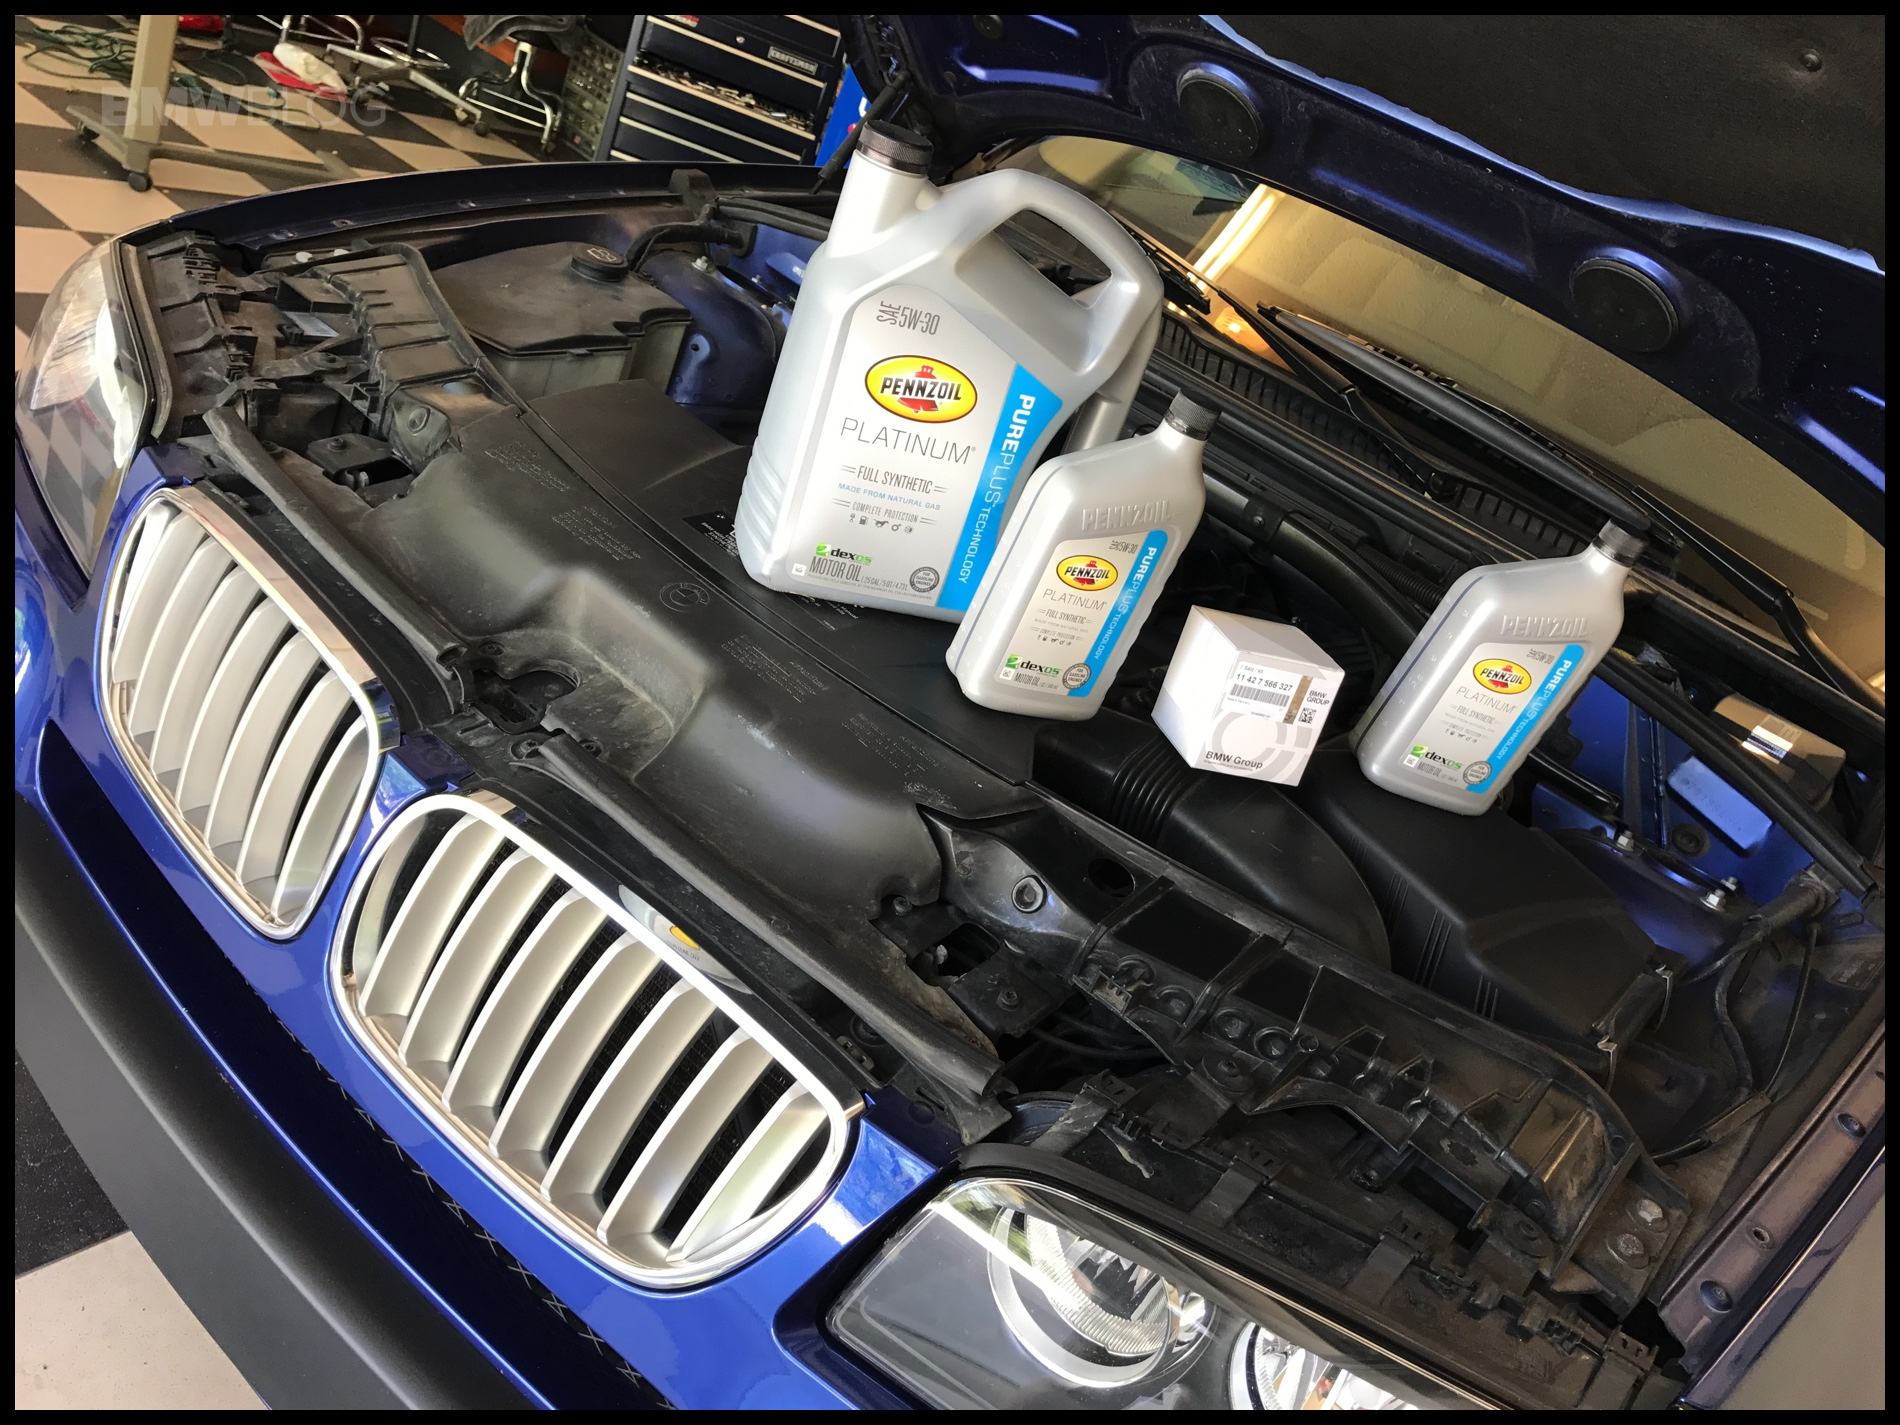 BMW X3 oil change 03 830x623